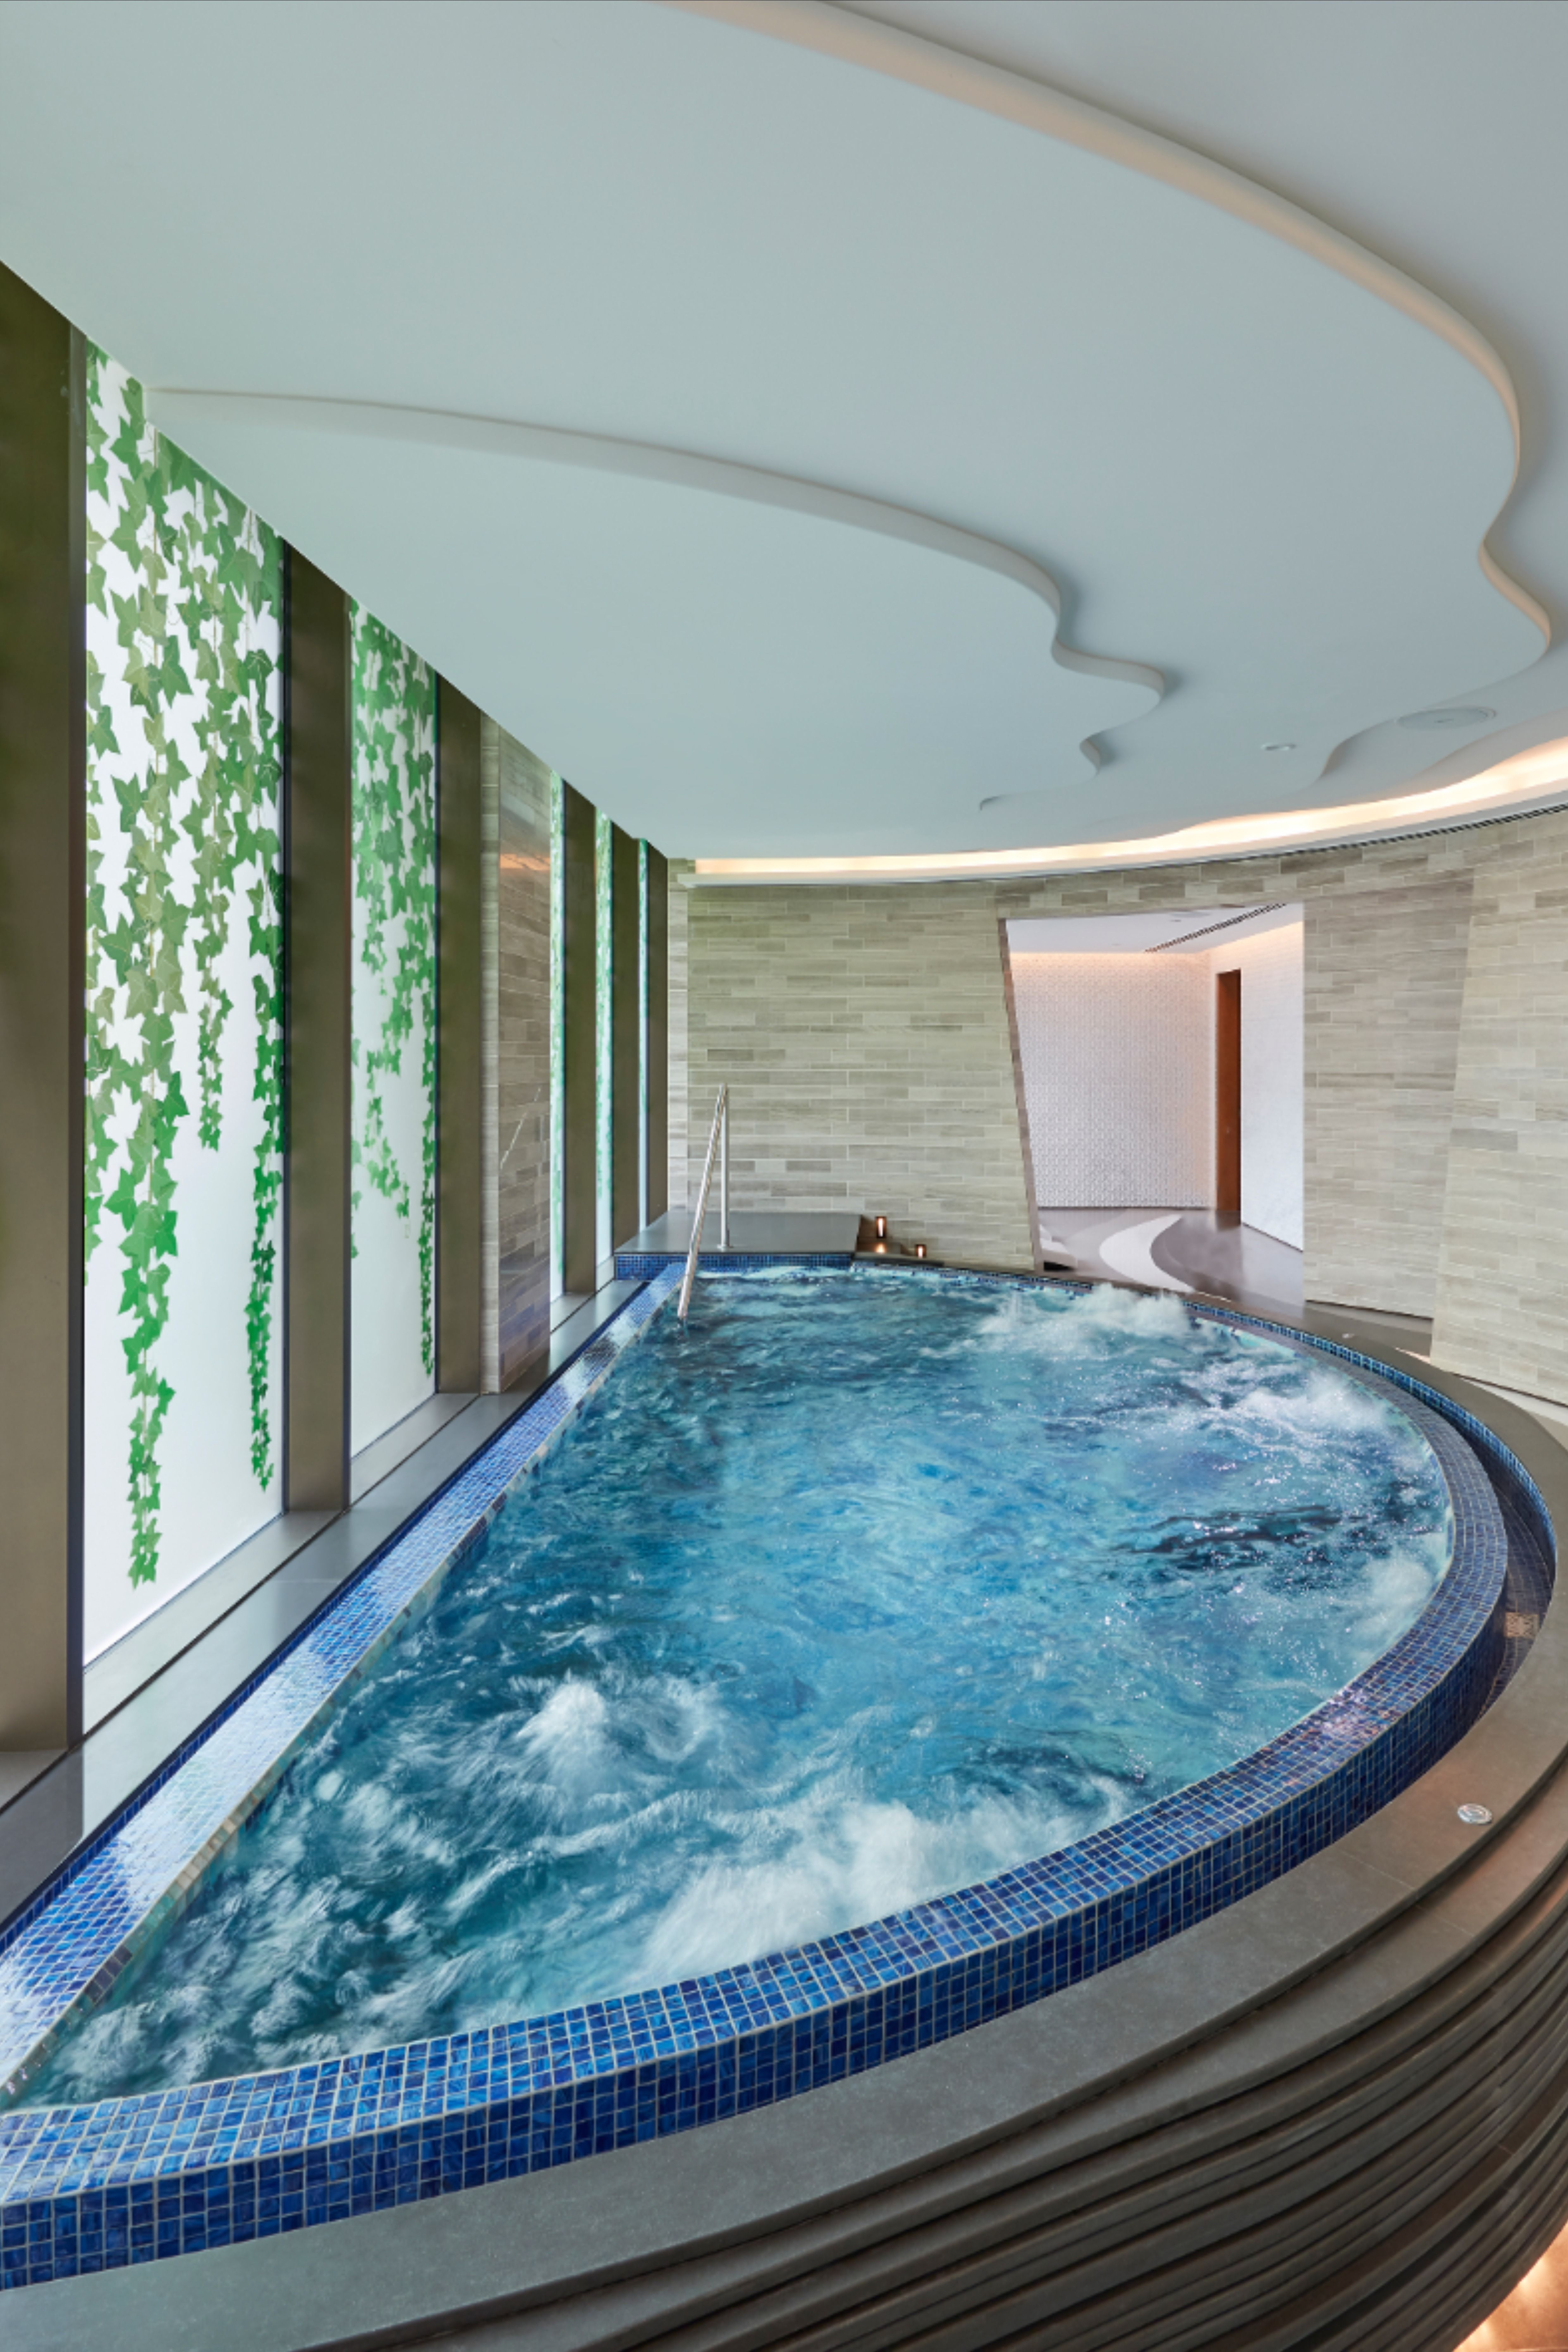 The Spa At Mandarin Oriental Jumeira Dubai Luxury Beach Resorts Luxury Hotel Hotel